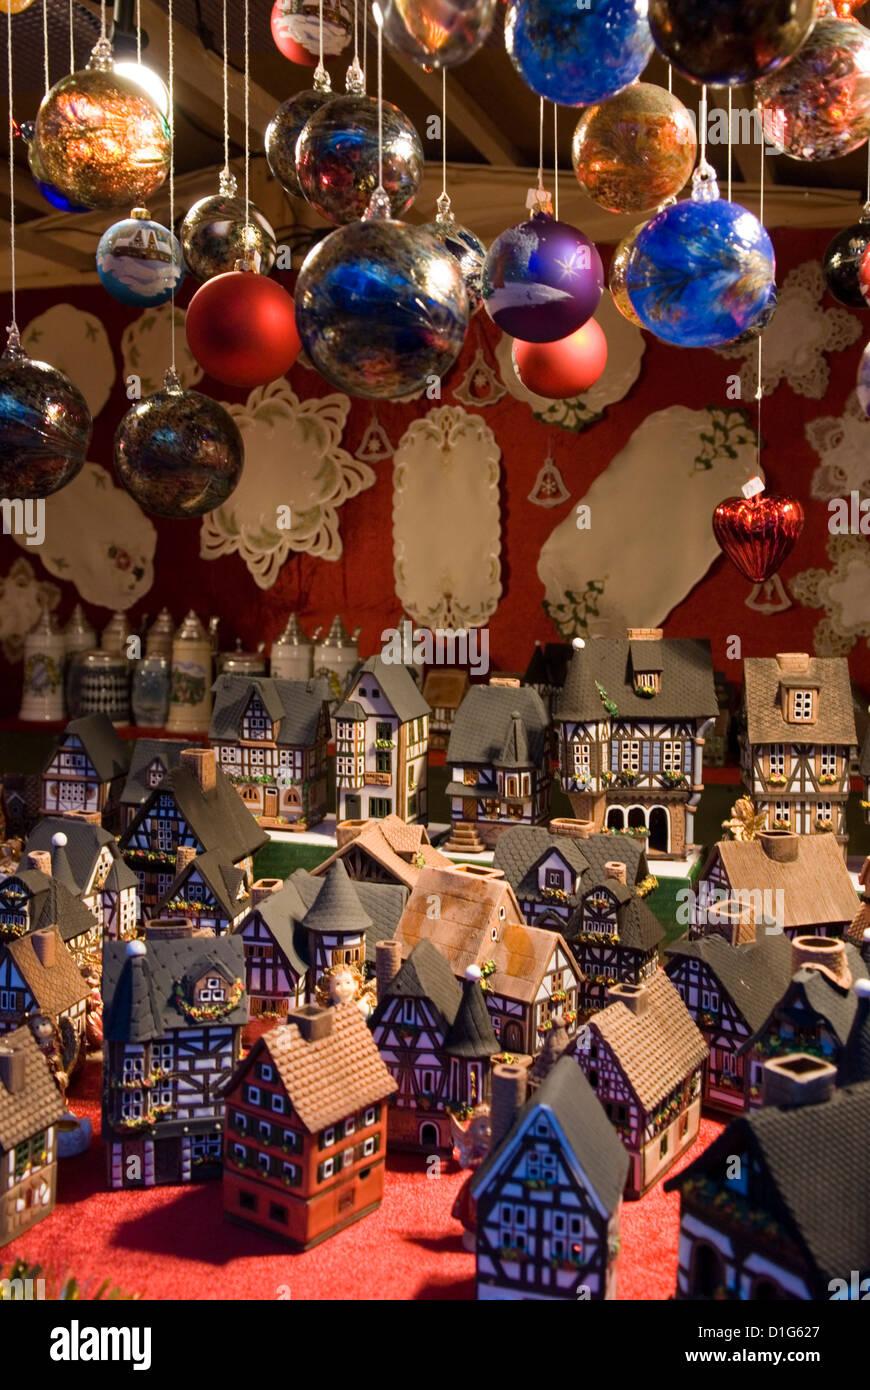 Decoración de Navidad cala, Berlín, Alemania, Europa Imagen De Stock